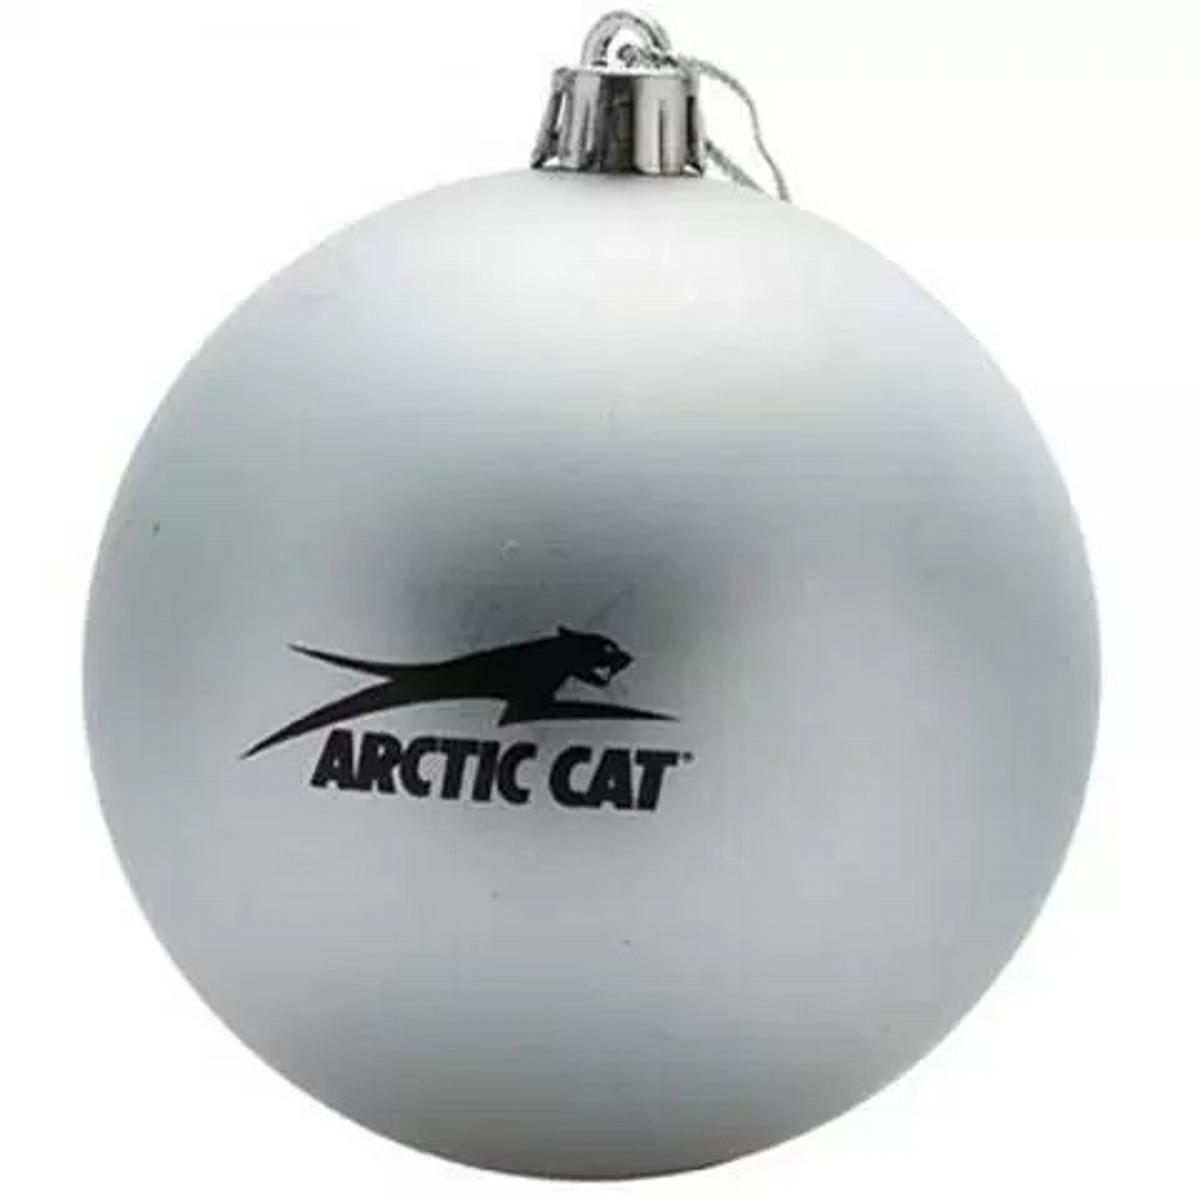 Idées de cadeaux de Noël - Arctic Cat